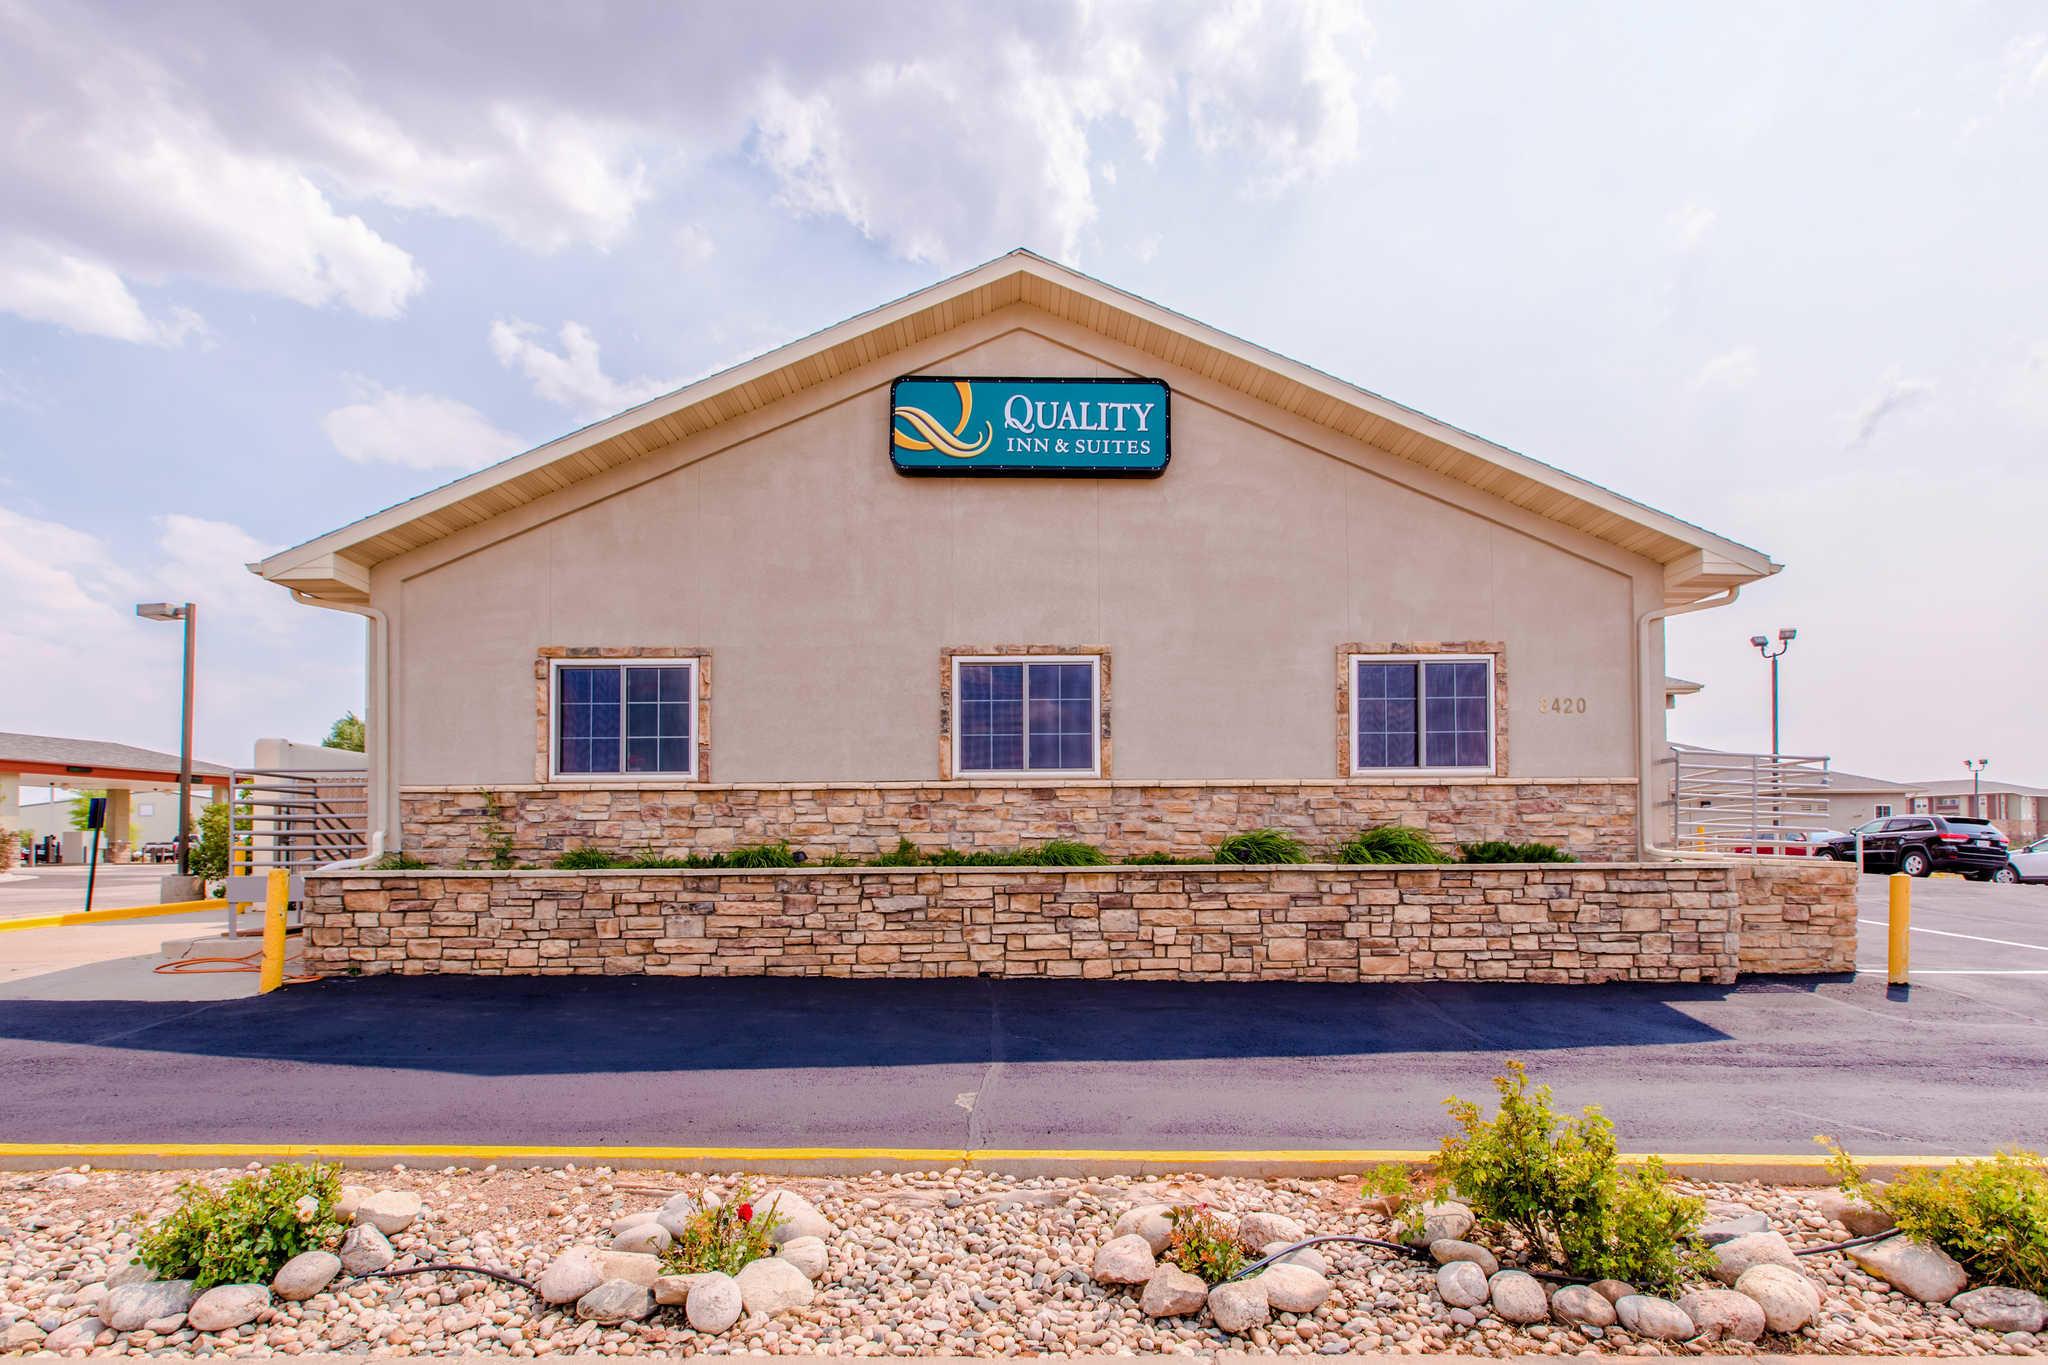 Hotels Laramie Wy Near University